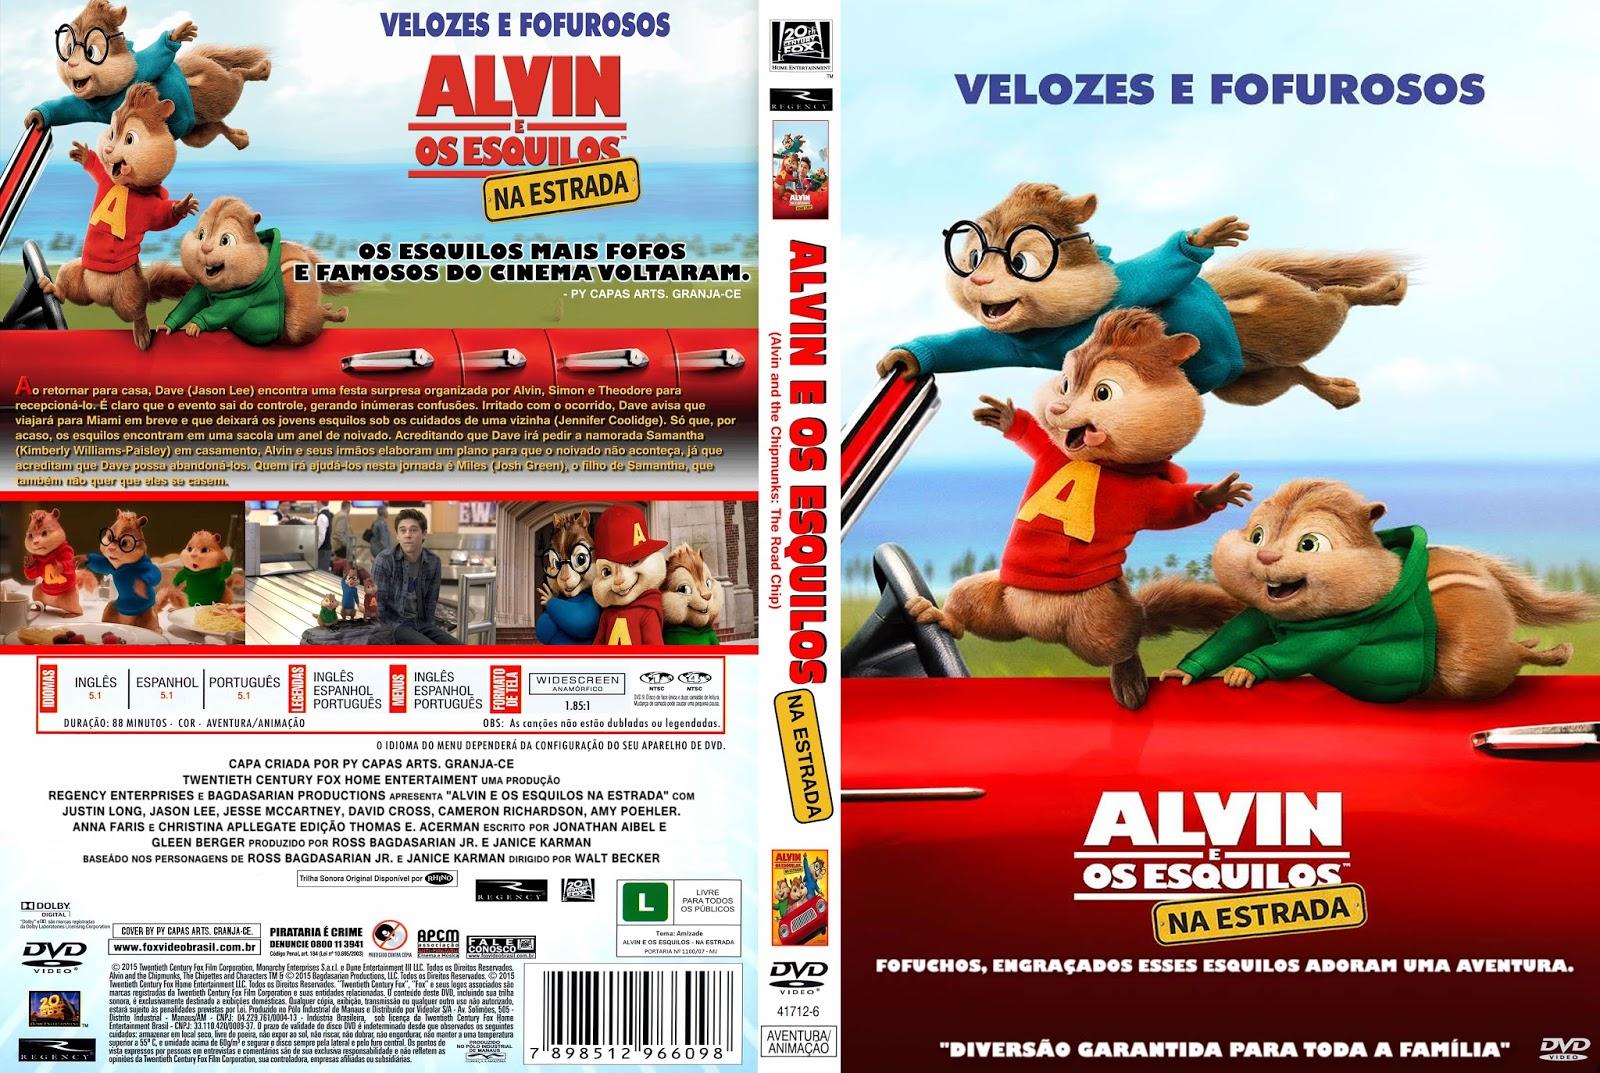 Alvin e os Esquilos Na Estrada BDRip XviD Dual Áudio ALVIN 2BE 2BOS 2BESQUILOS 2B4 2B  2BNA 2BESTRADA